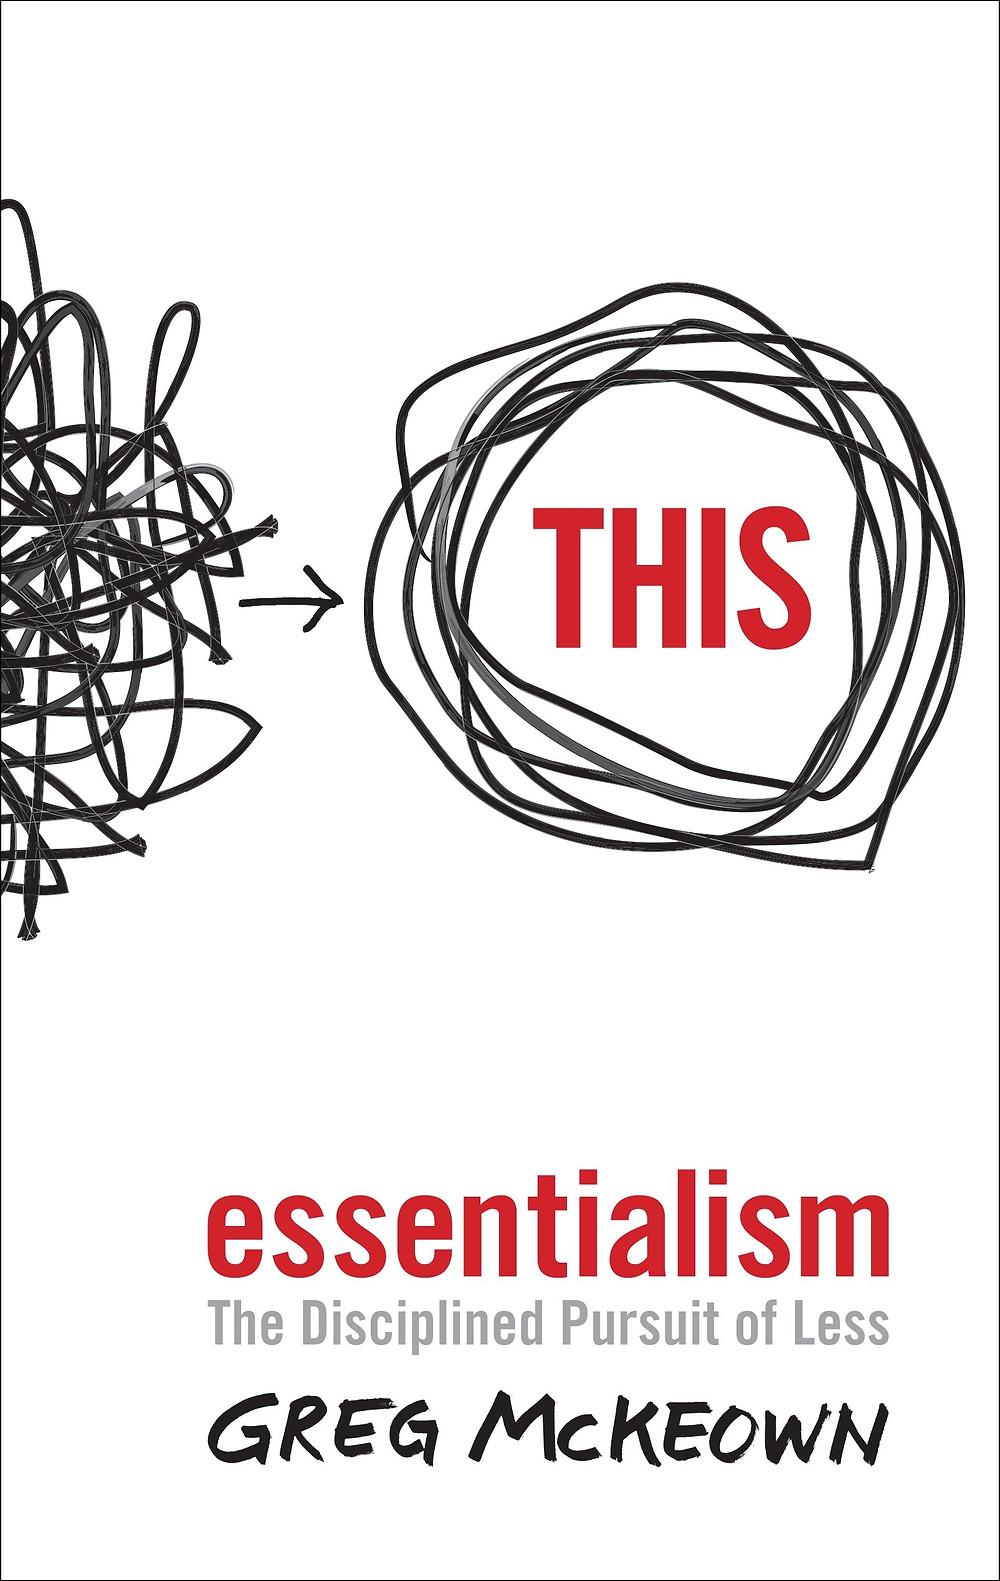 Essentialism: The Disciplined Pursuit